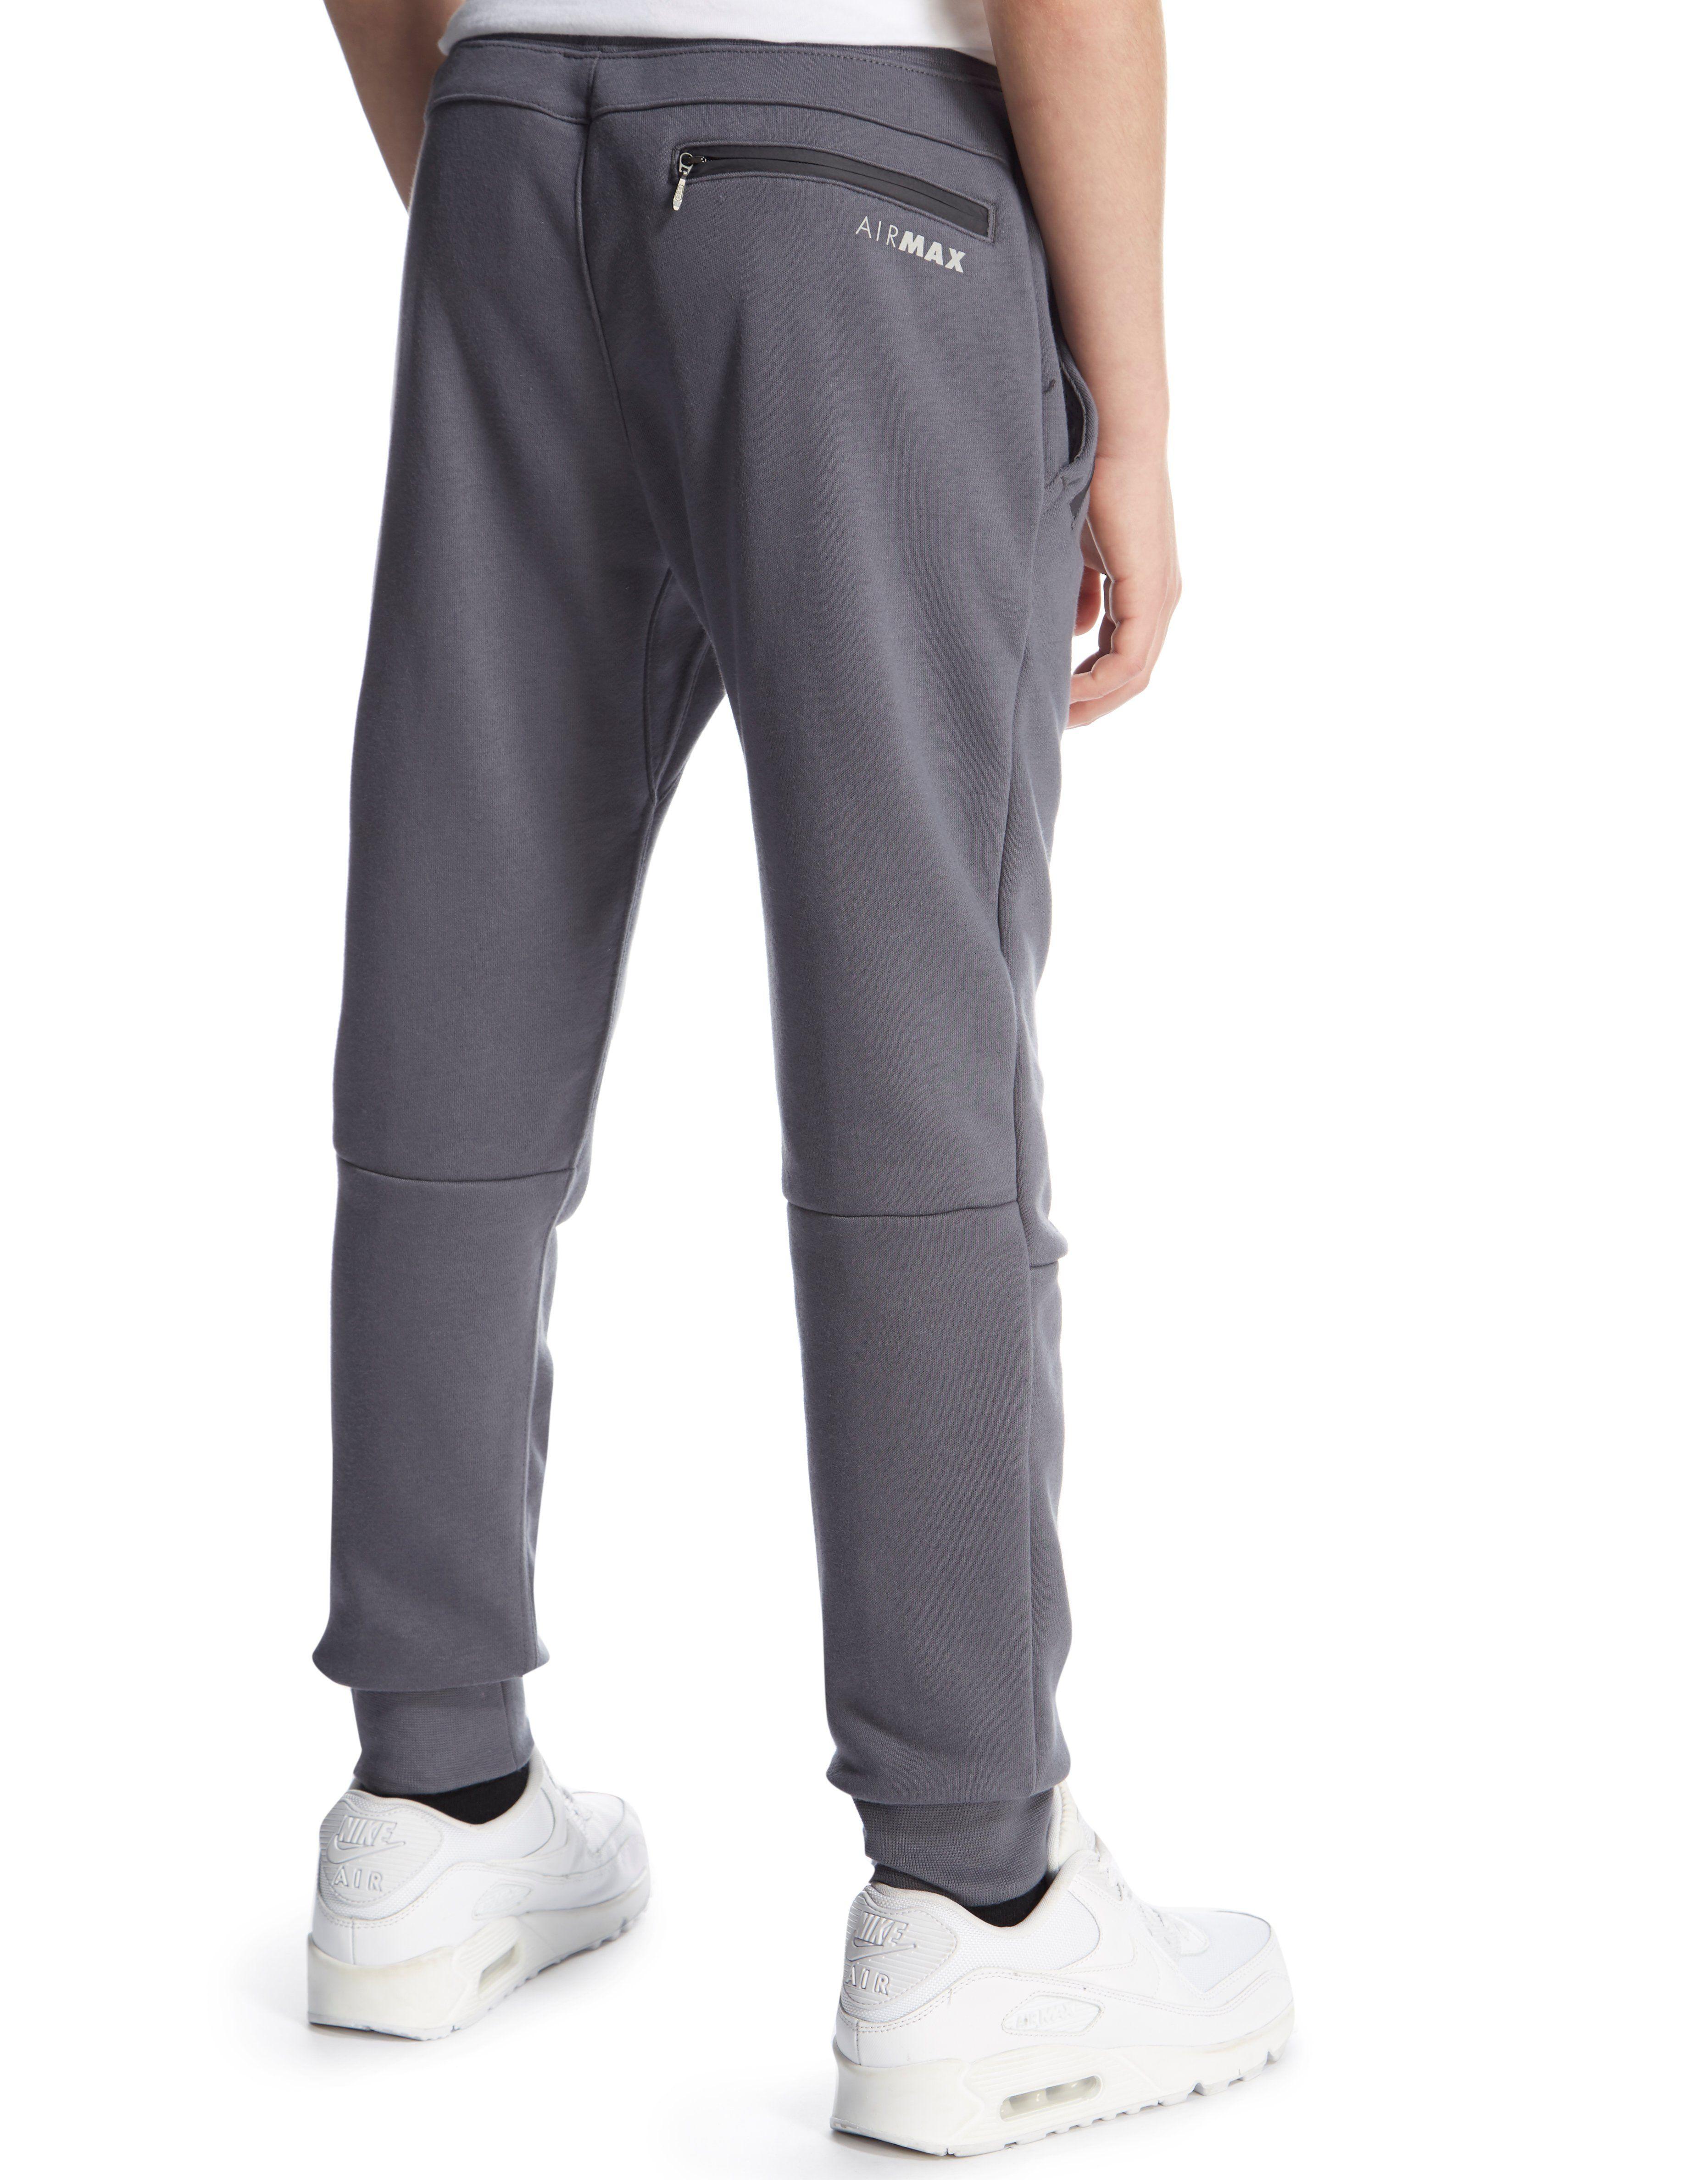 Original Air Max Zero With Jogger Pants